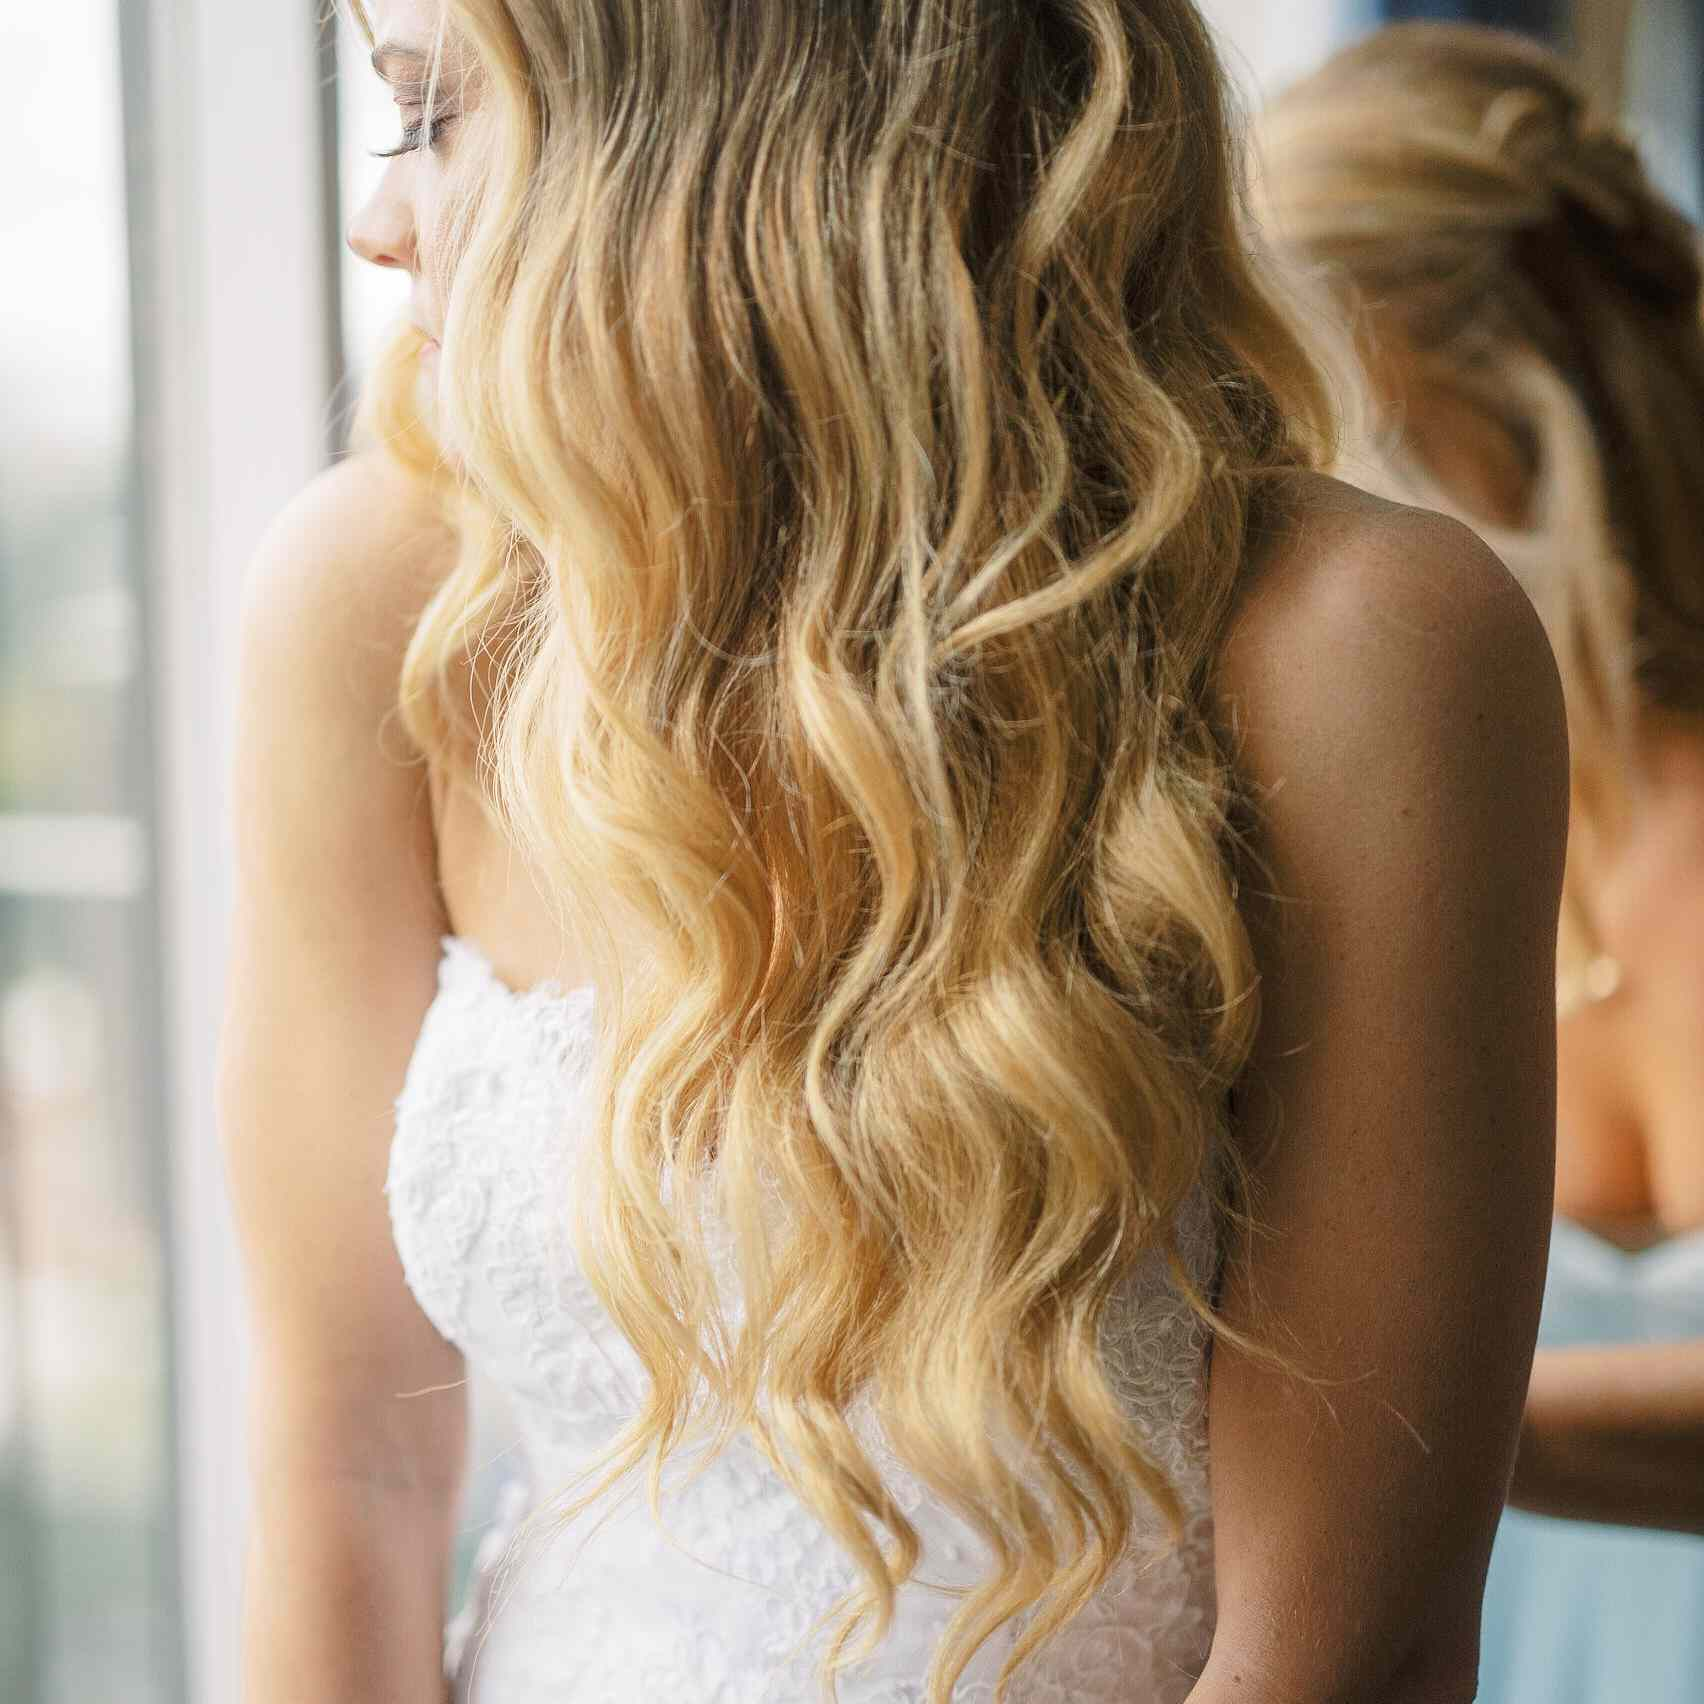 whimsical savannah wedding, bridesmaid zipping brides dress